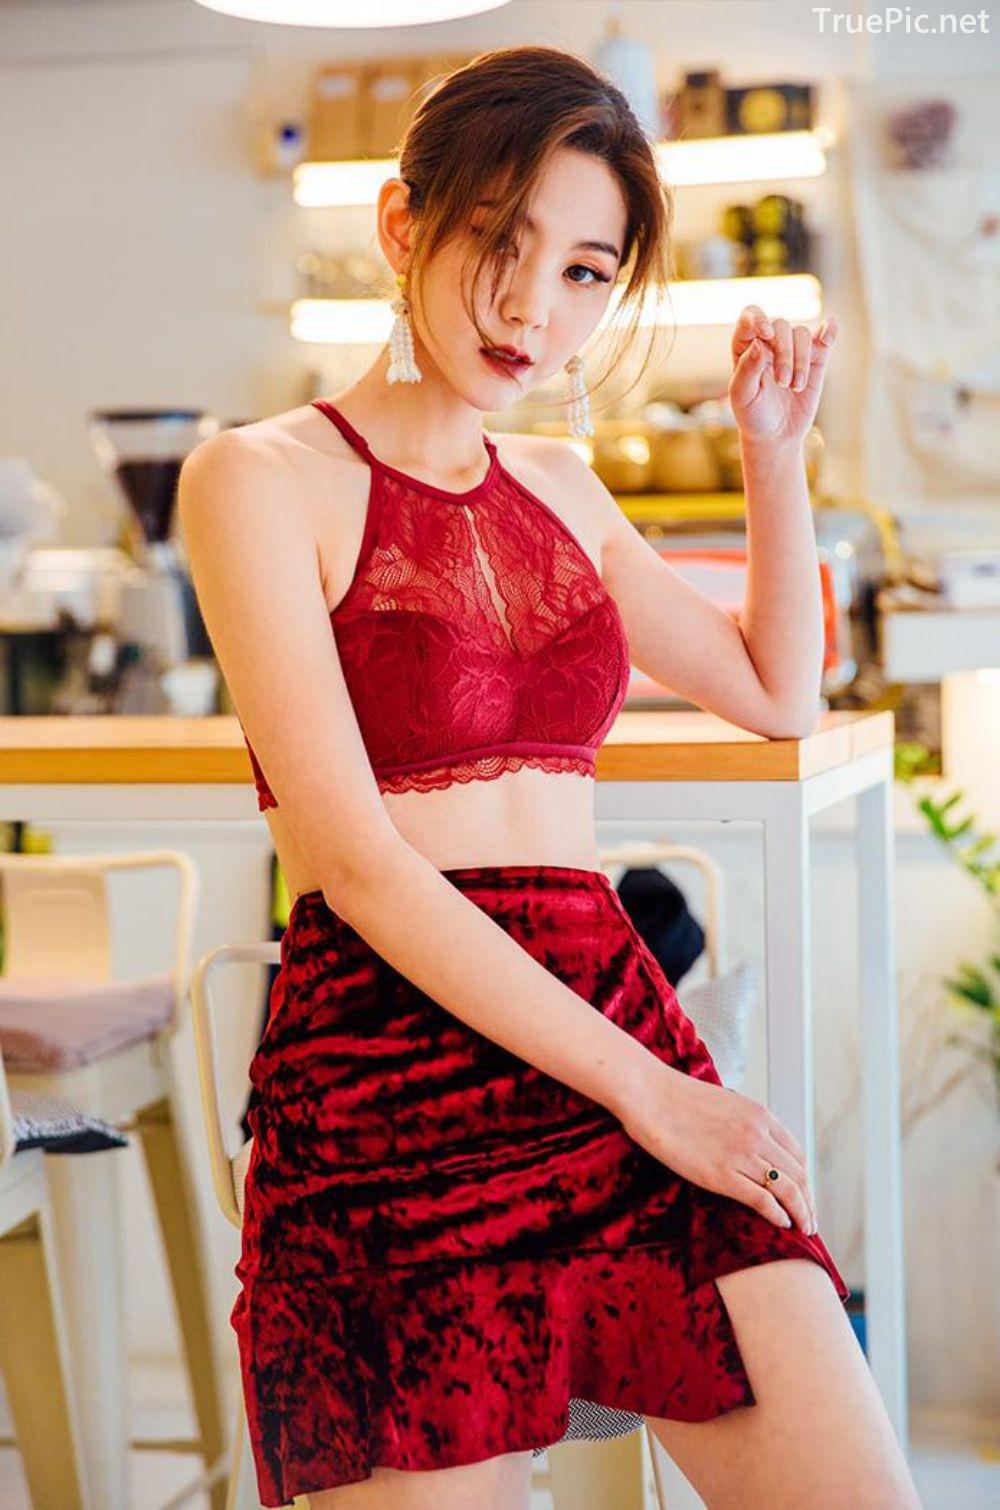 Korean Lingerie Queen - Lee Chae Eun - Red and Black Rabbit Lingerie - TruePic.net - Picture 6